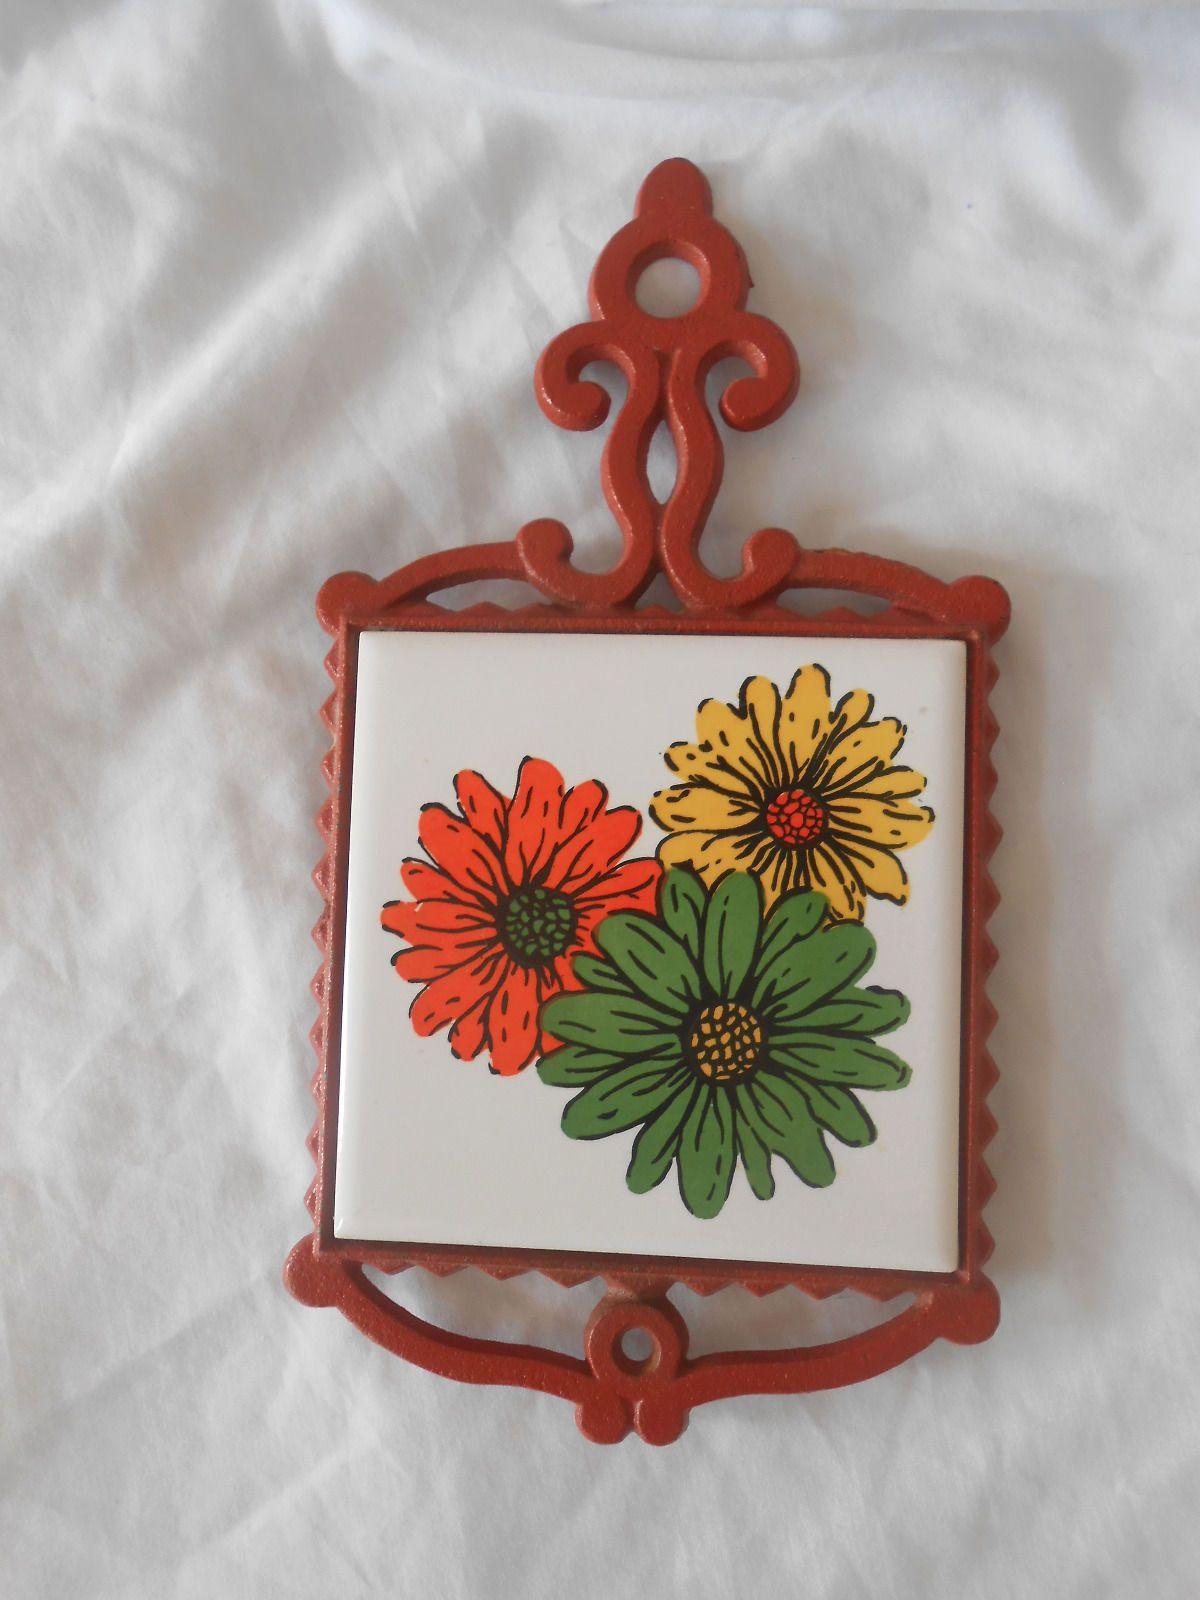 Vintage cherry cast iron ceramic tile trivet made in japan floral vintage cherry cast iron ceramic tile trivet made in japan floral design ebay dailygadgetfo Choice Image